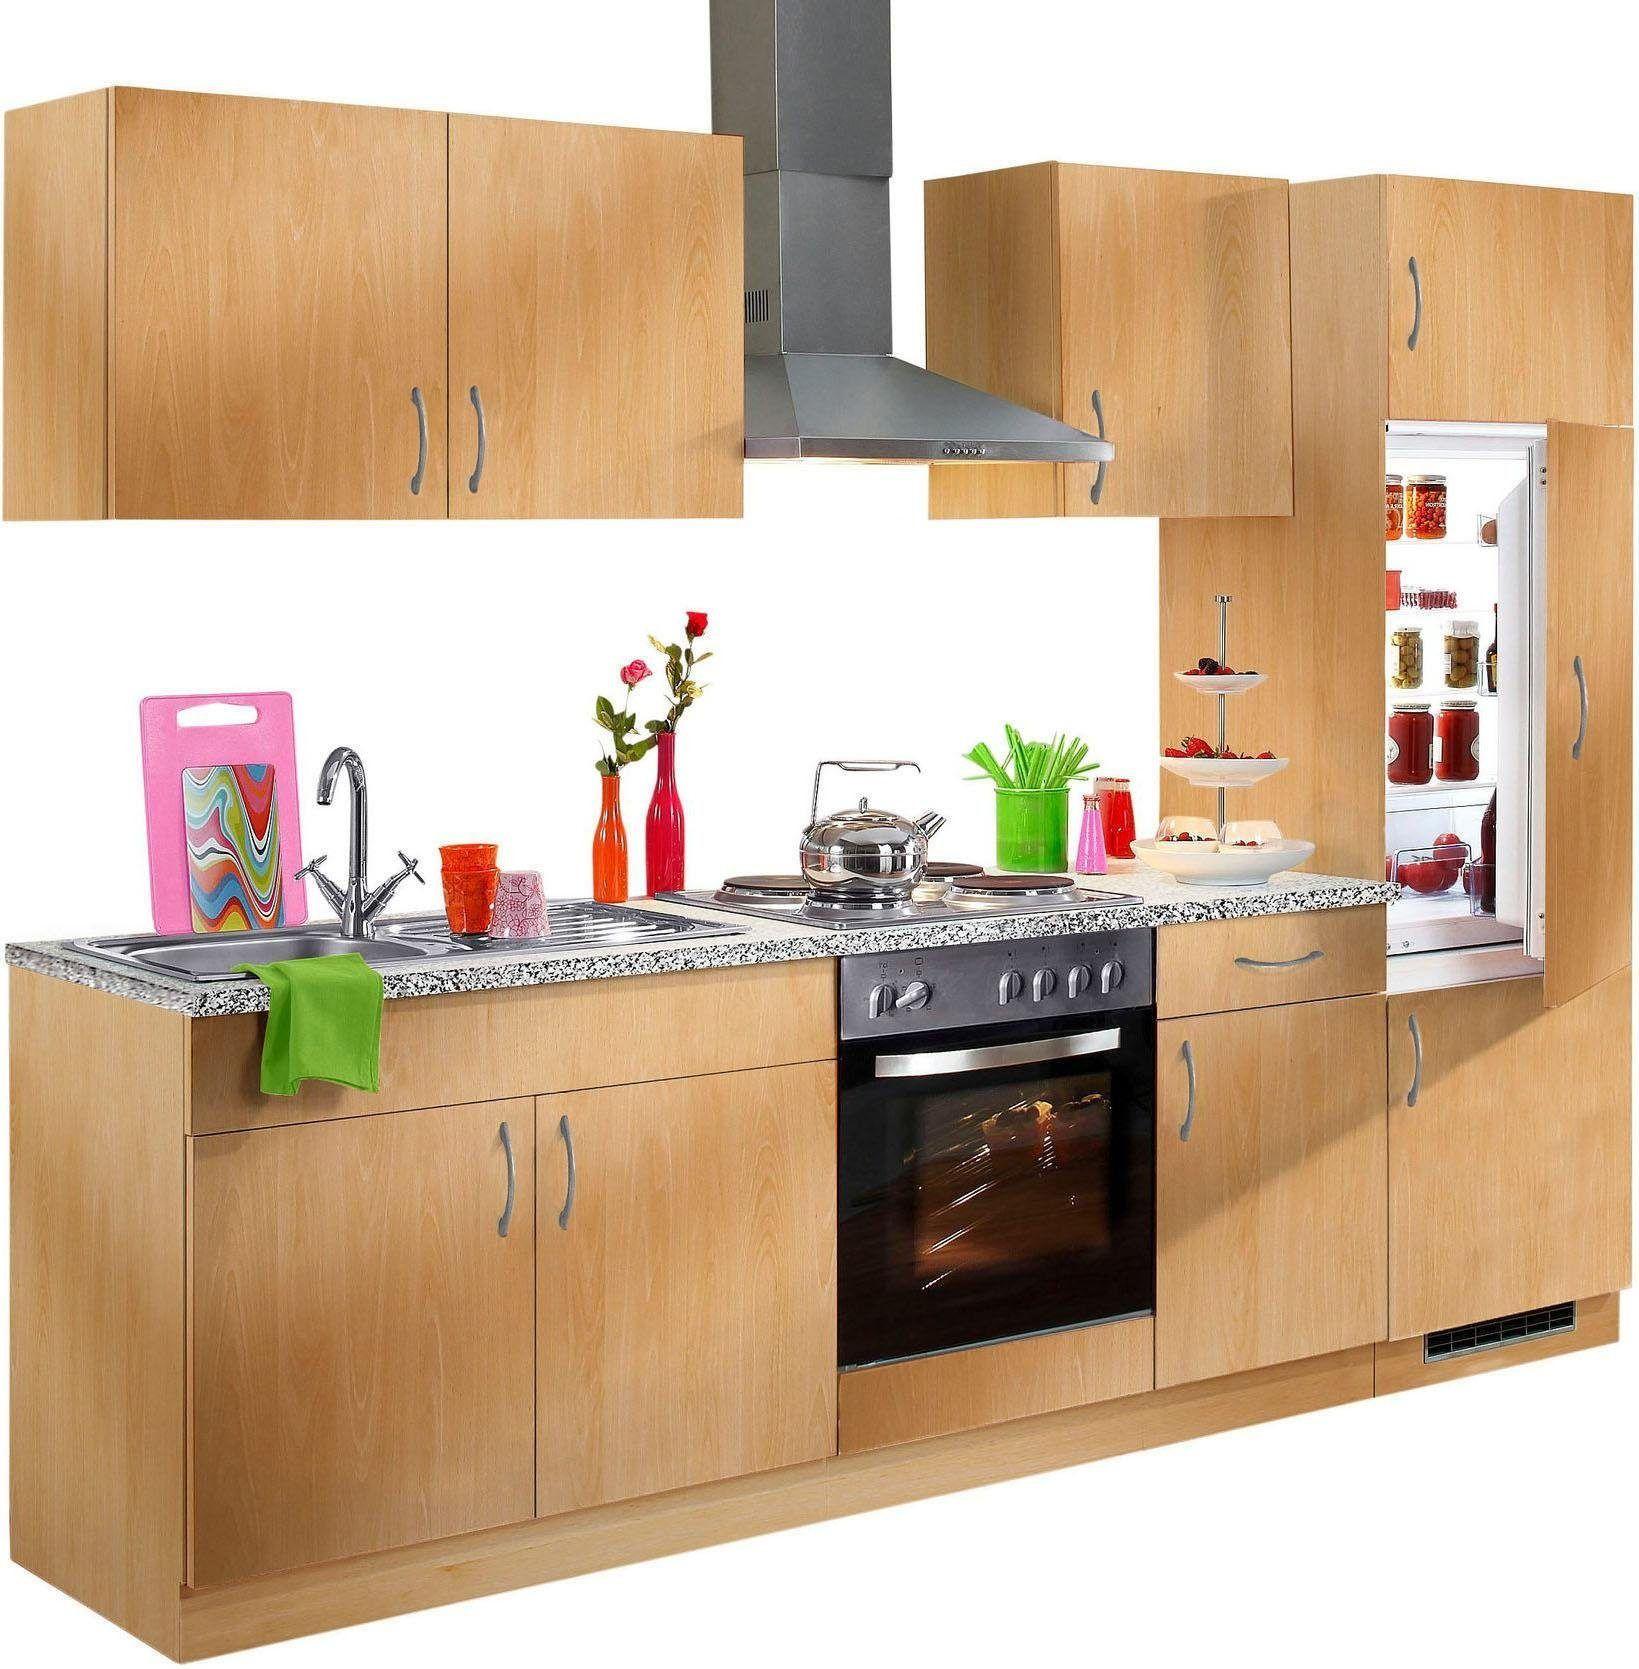 Wiho Kuchen Kitchen Cabinet I Shape Held In 2020 Kitchen Remodel Kitchen Home Kitchens